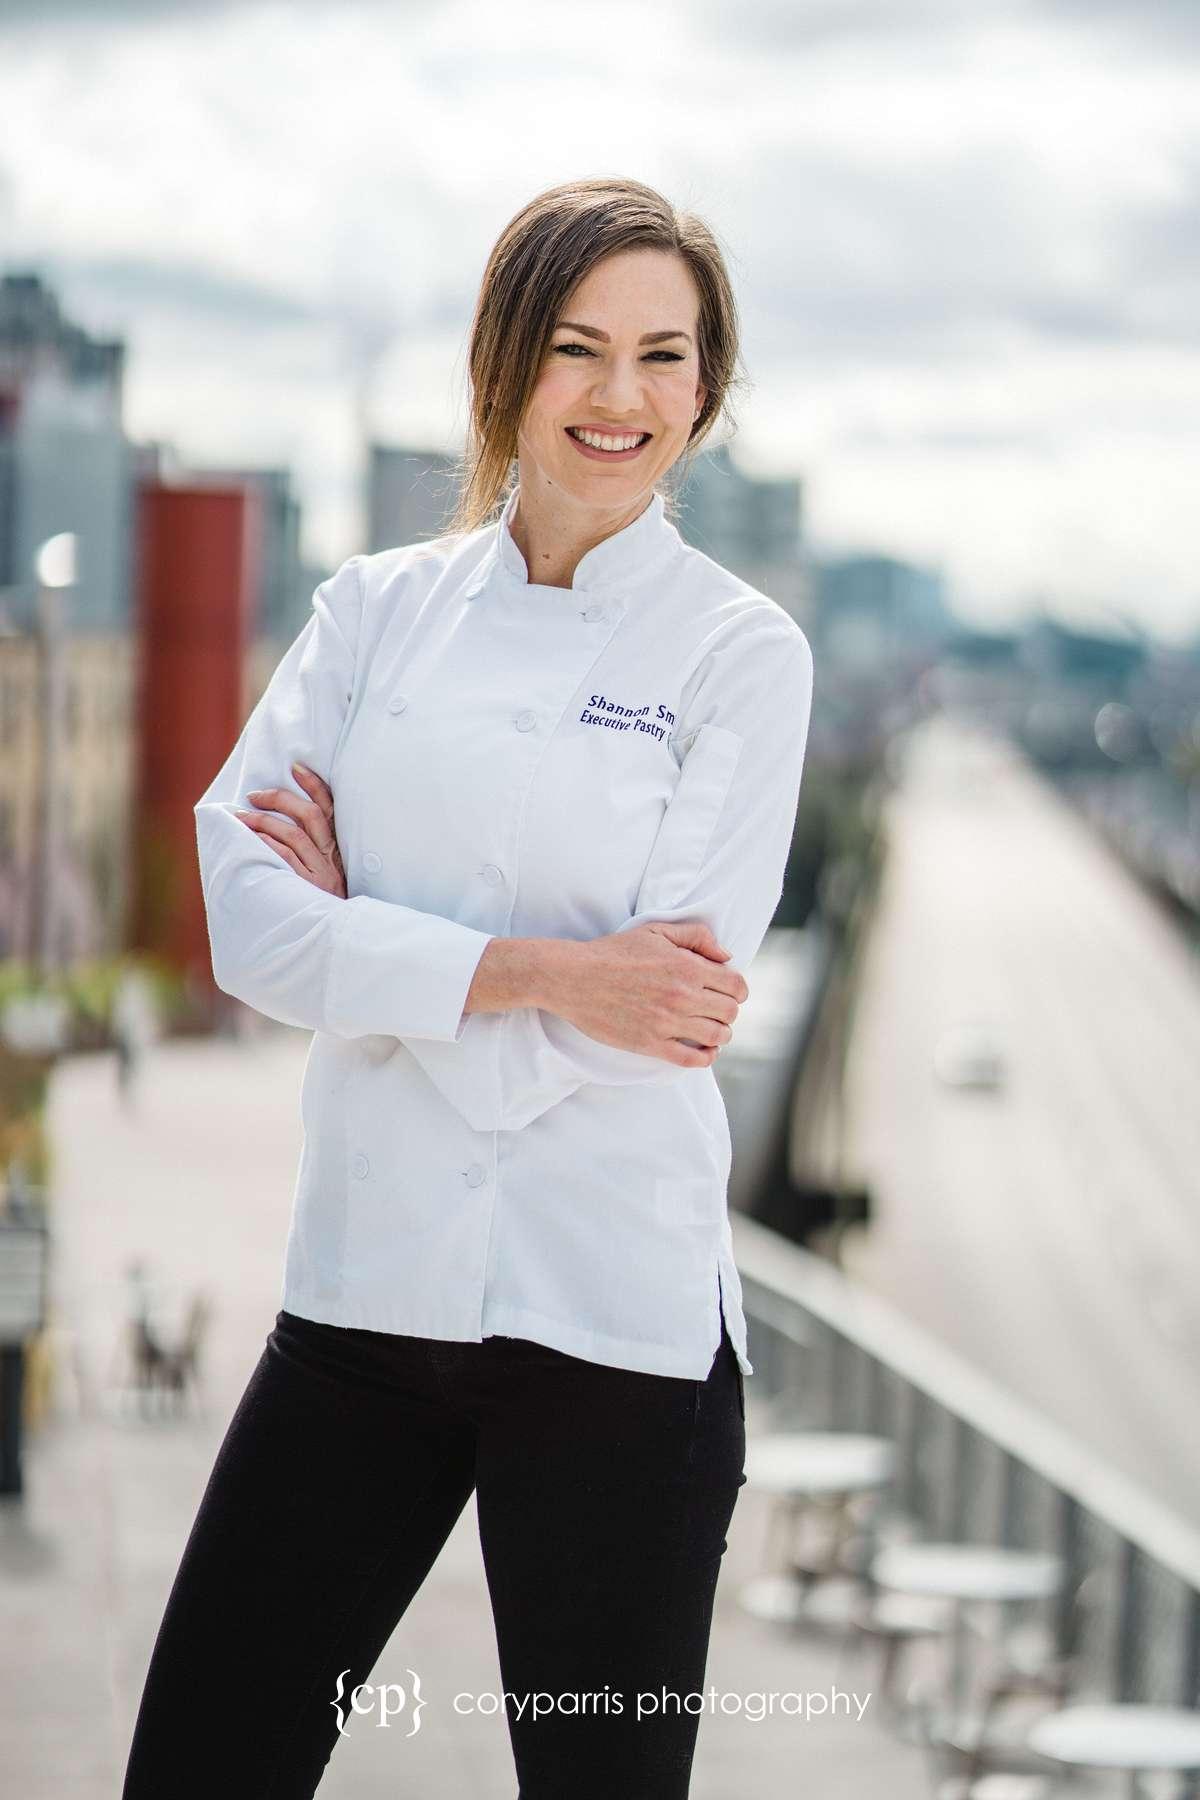 059-seattle-chef-portrait.jpg